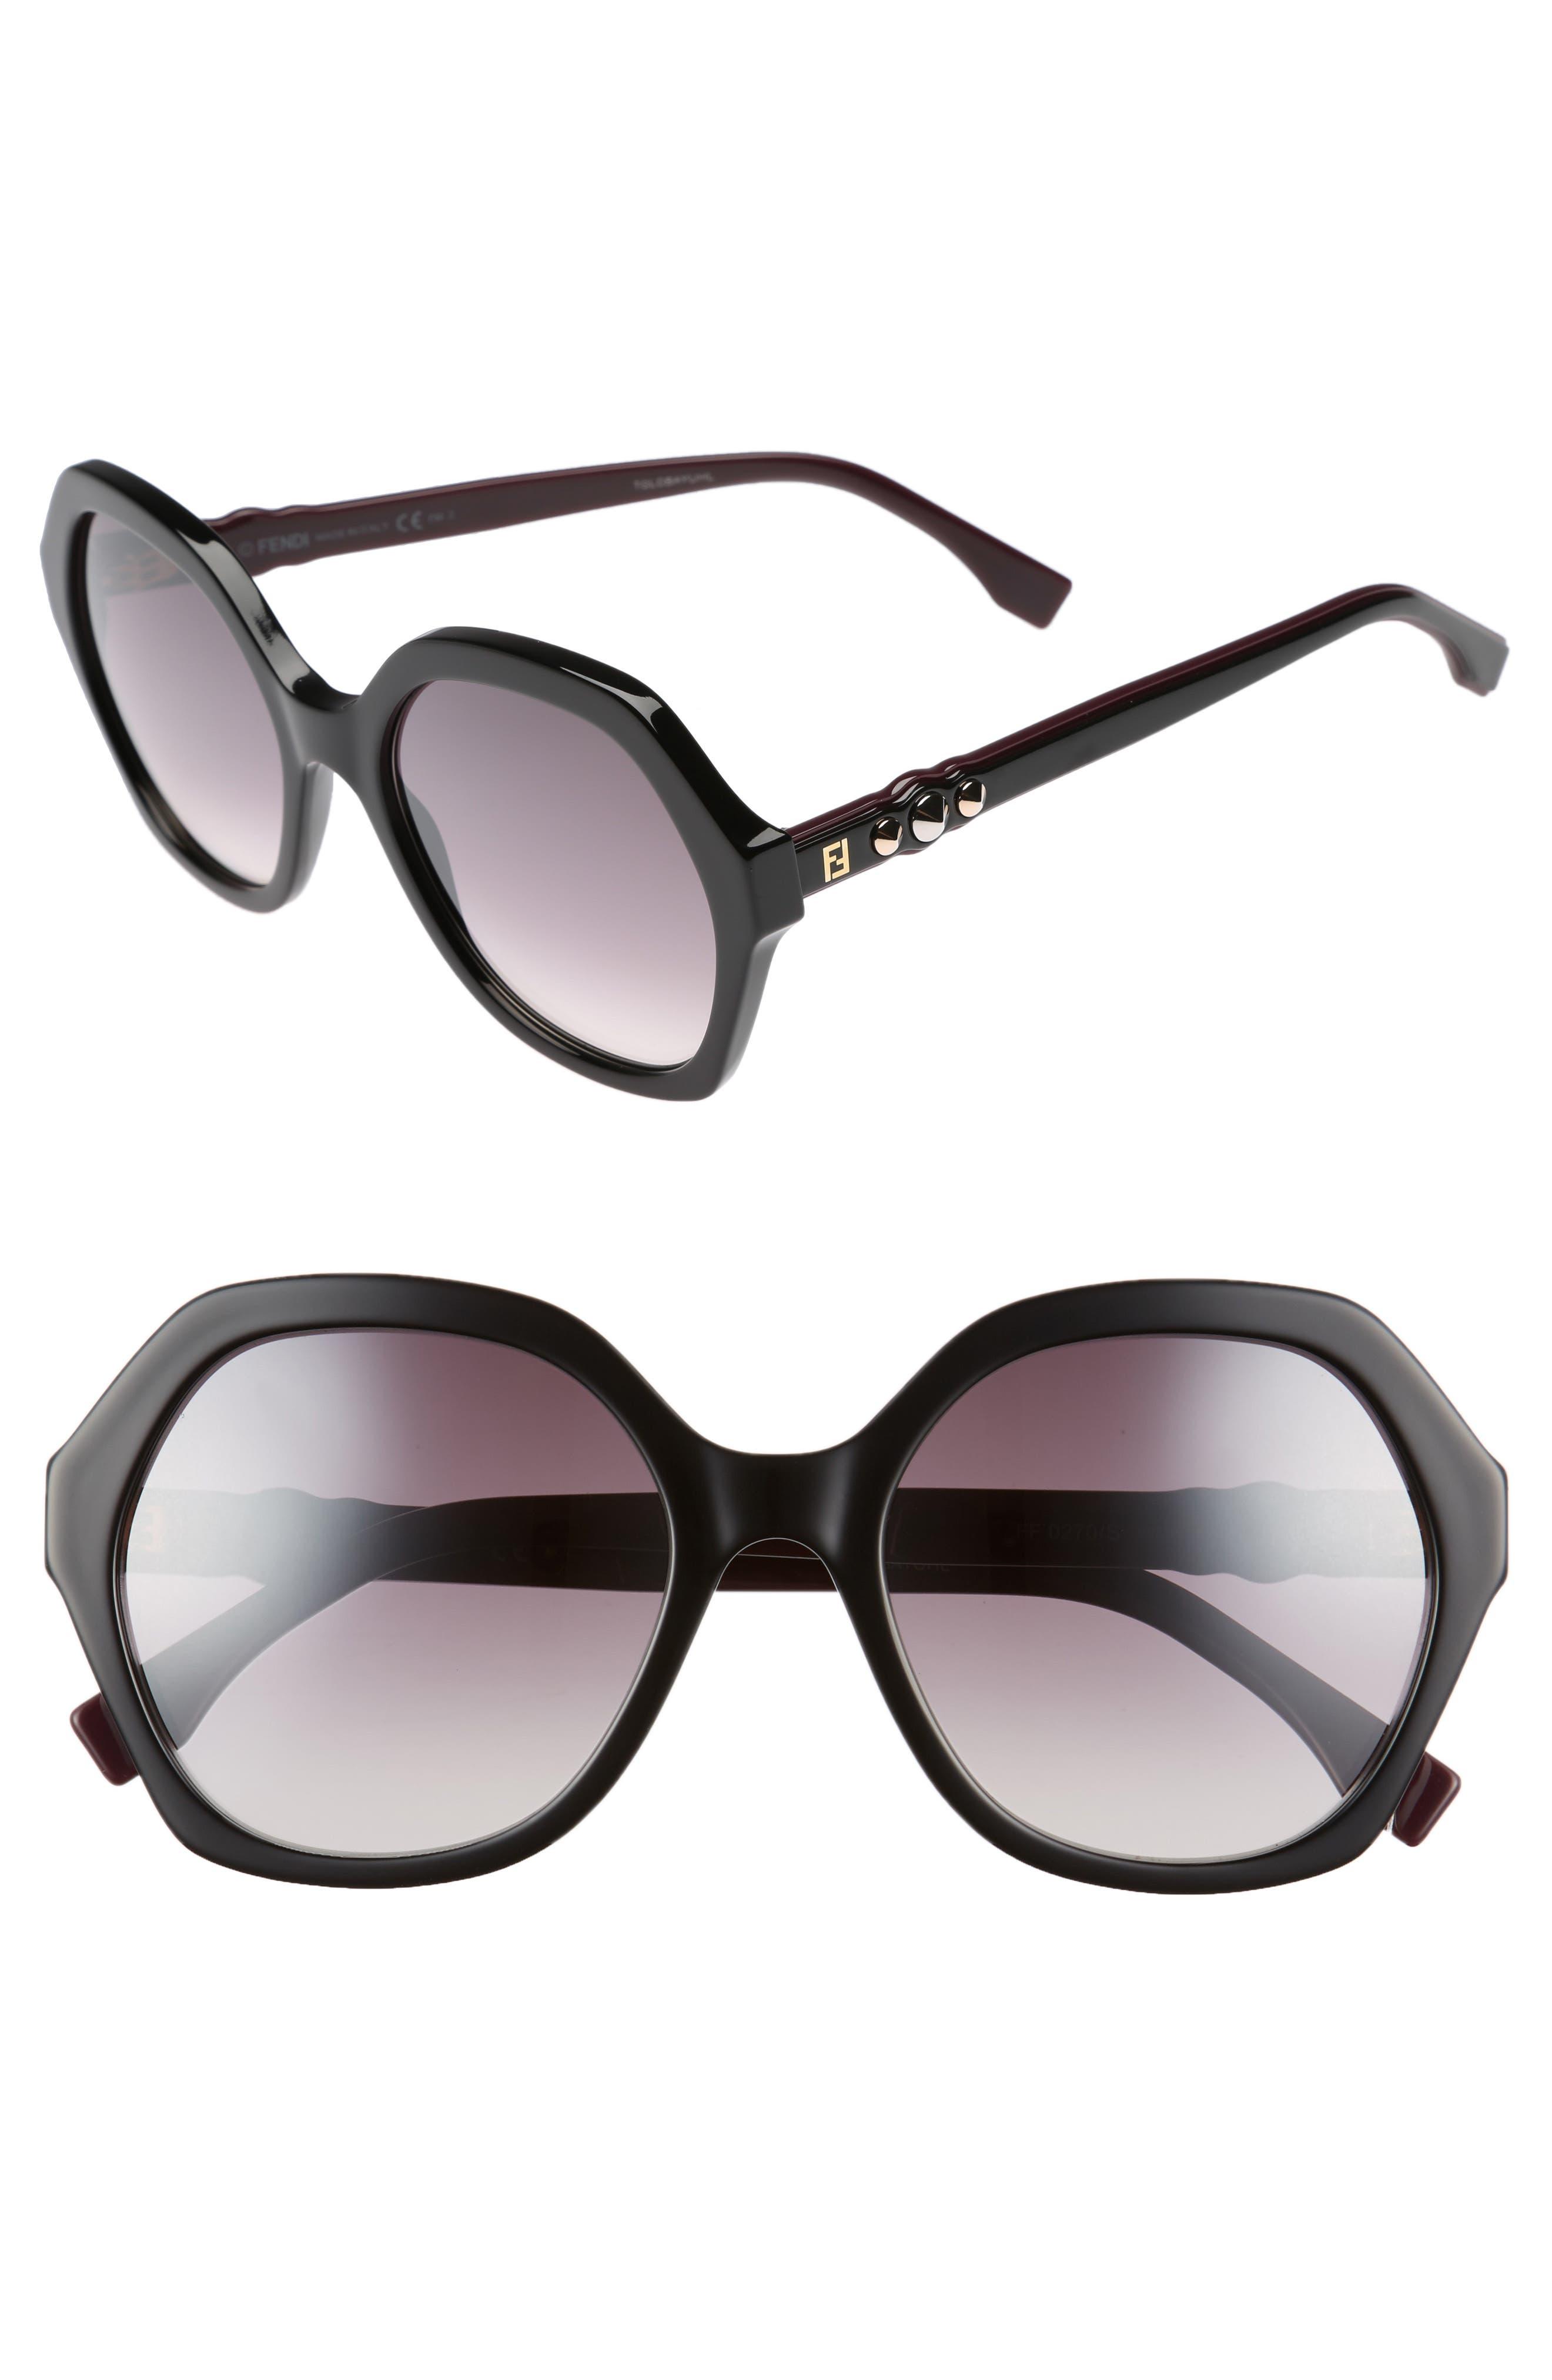 56mm Oversize Sunglasses,                             Main thumbnail 1, color,                             001